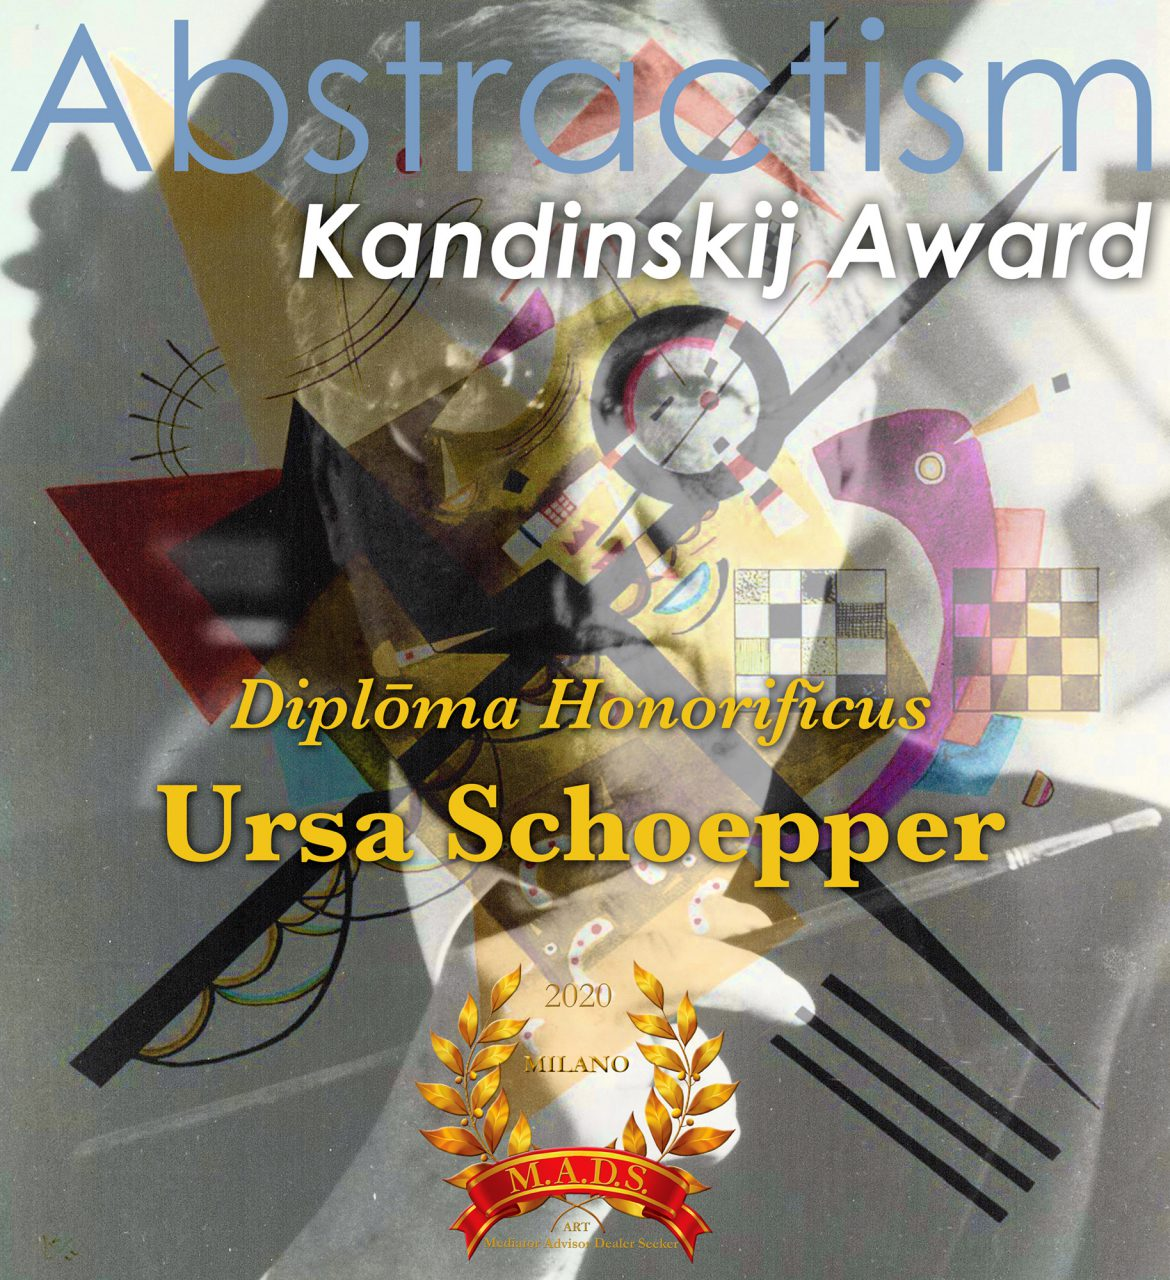 Kandinsky Award 2020 Diploma Honorificus